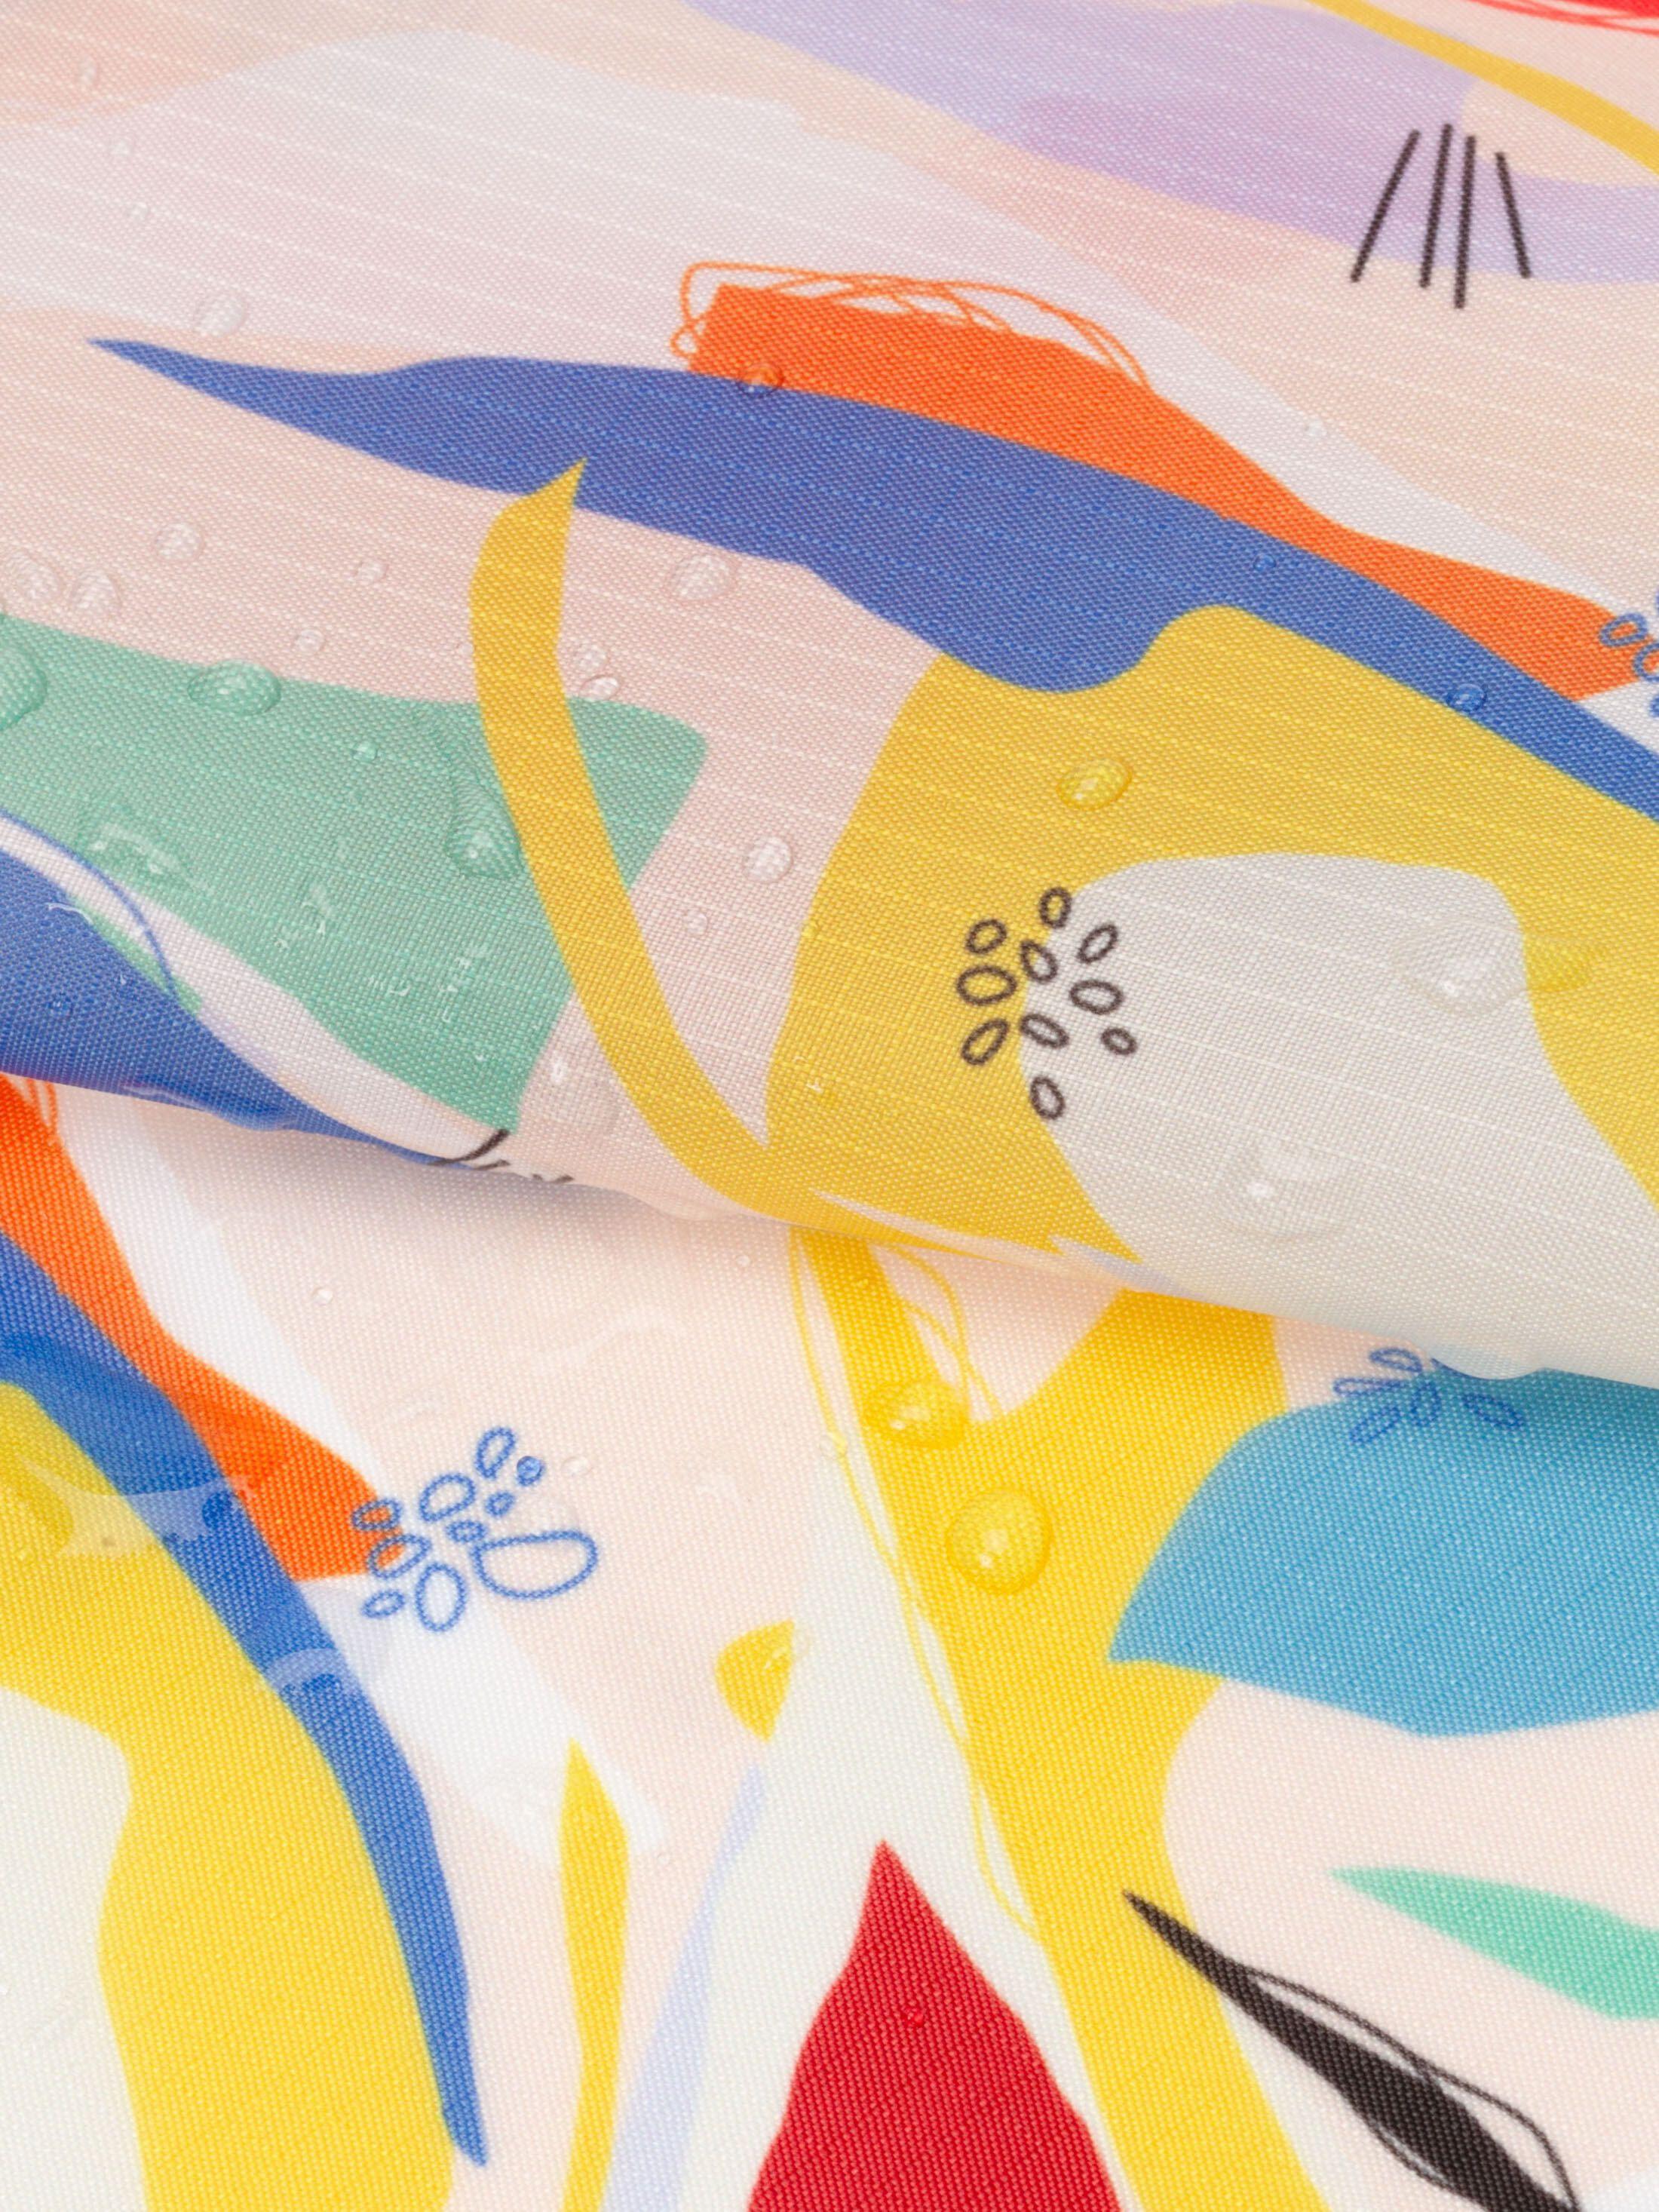 custom Ripstop fabric printing small print